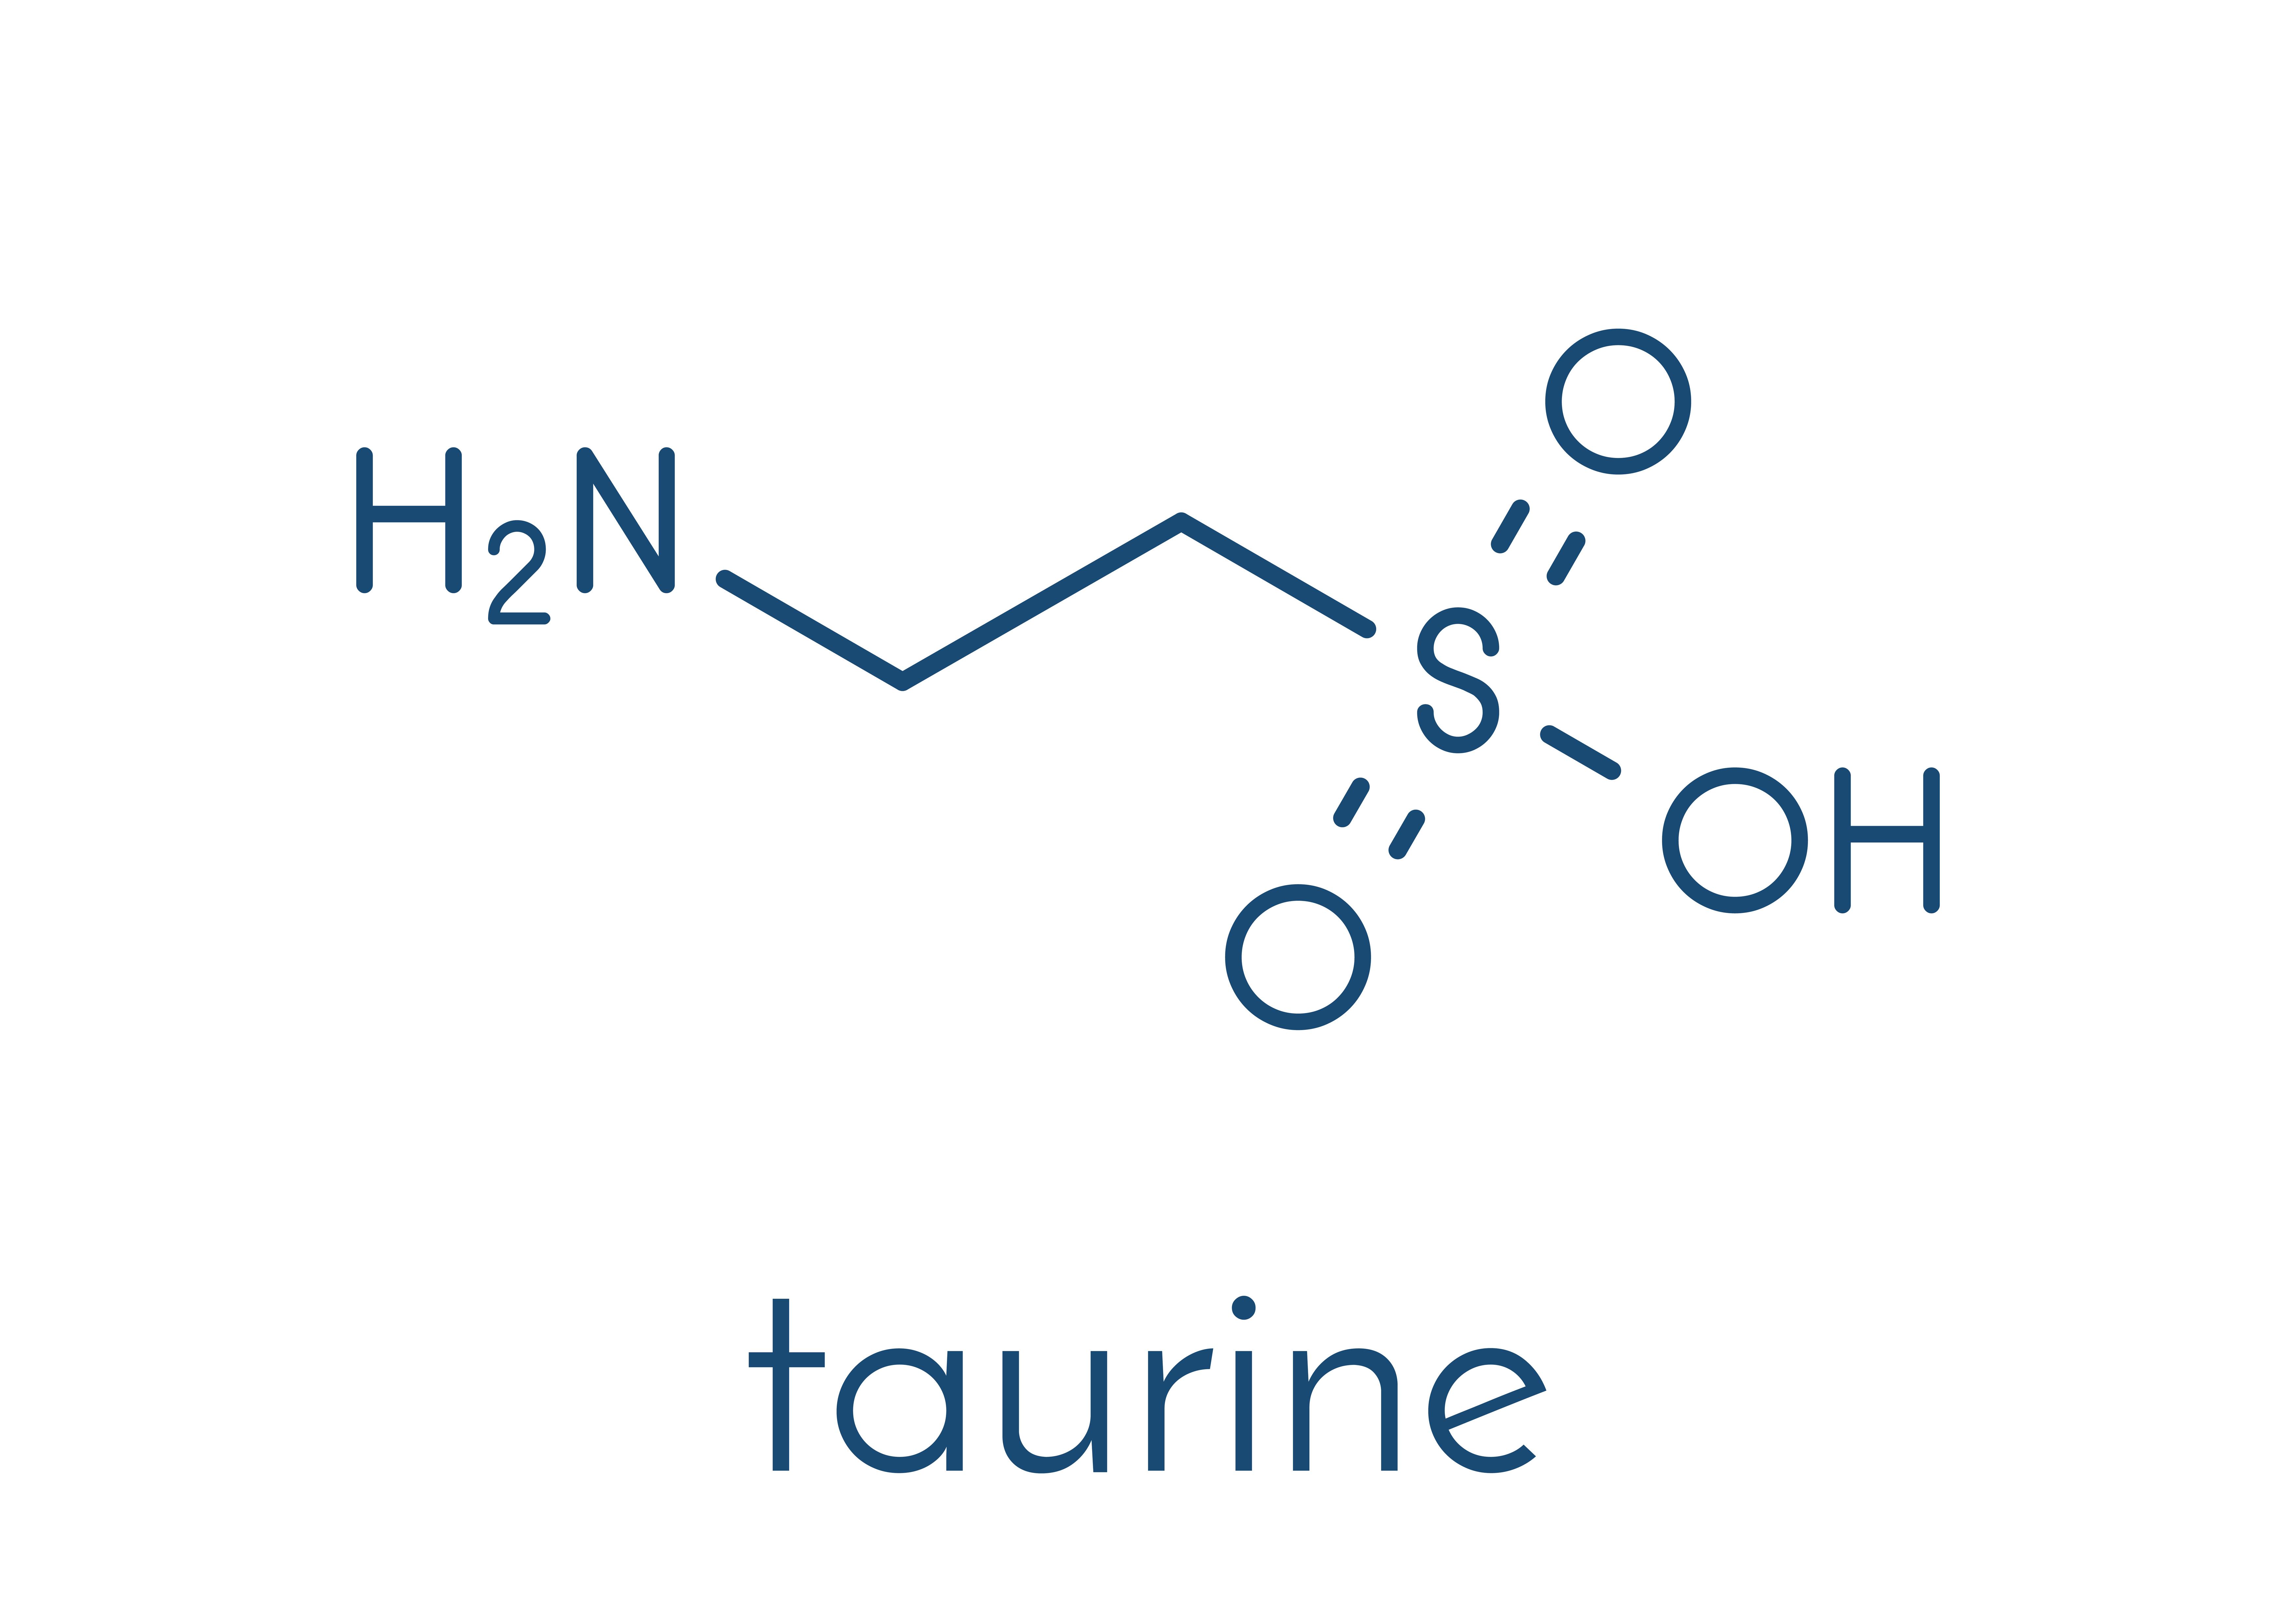 Taurine chemical formula